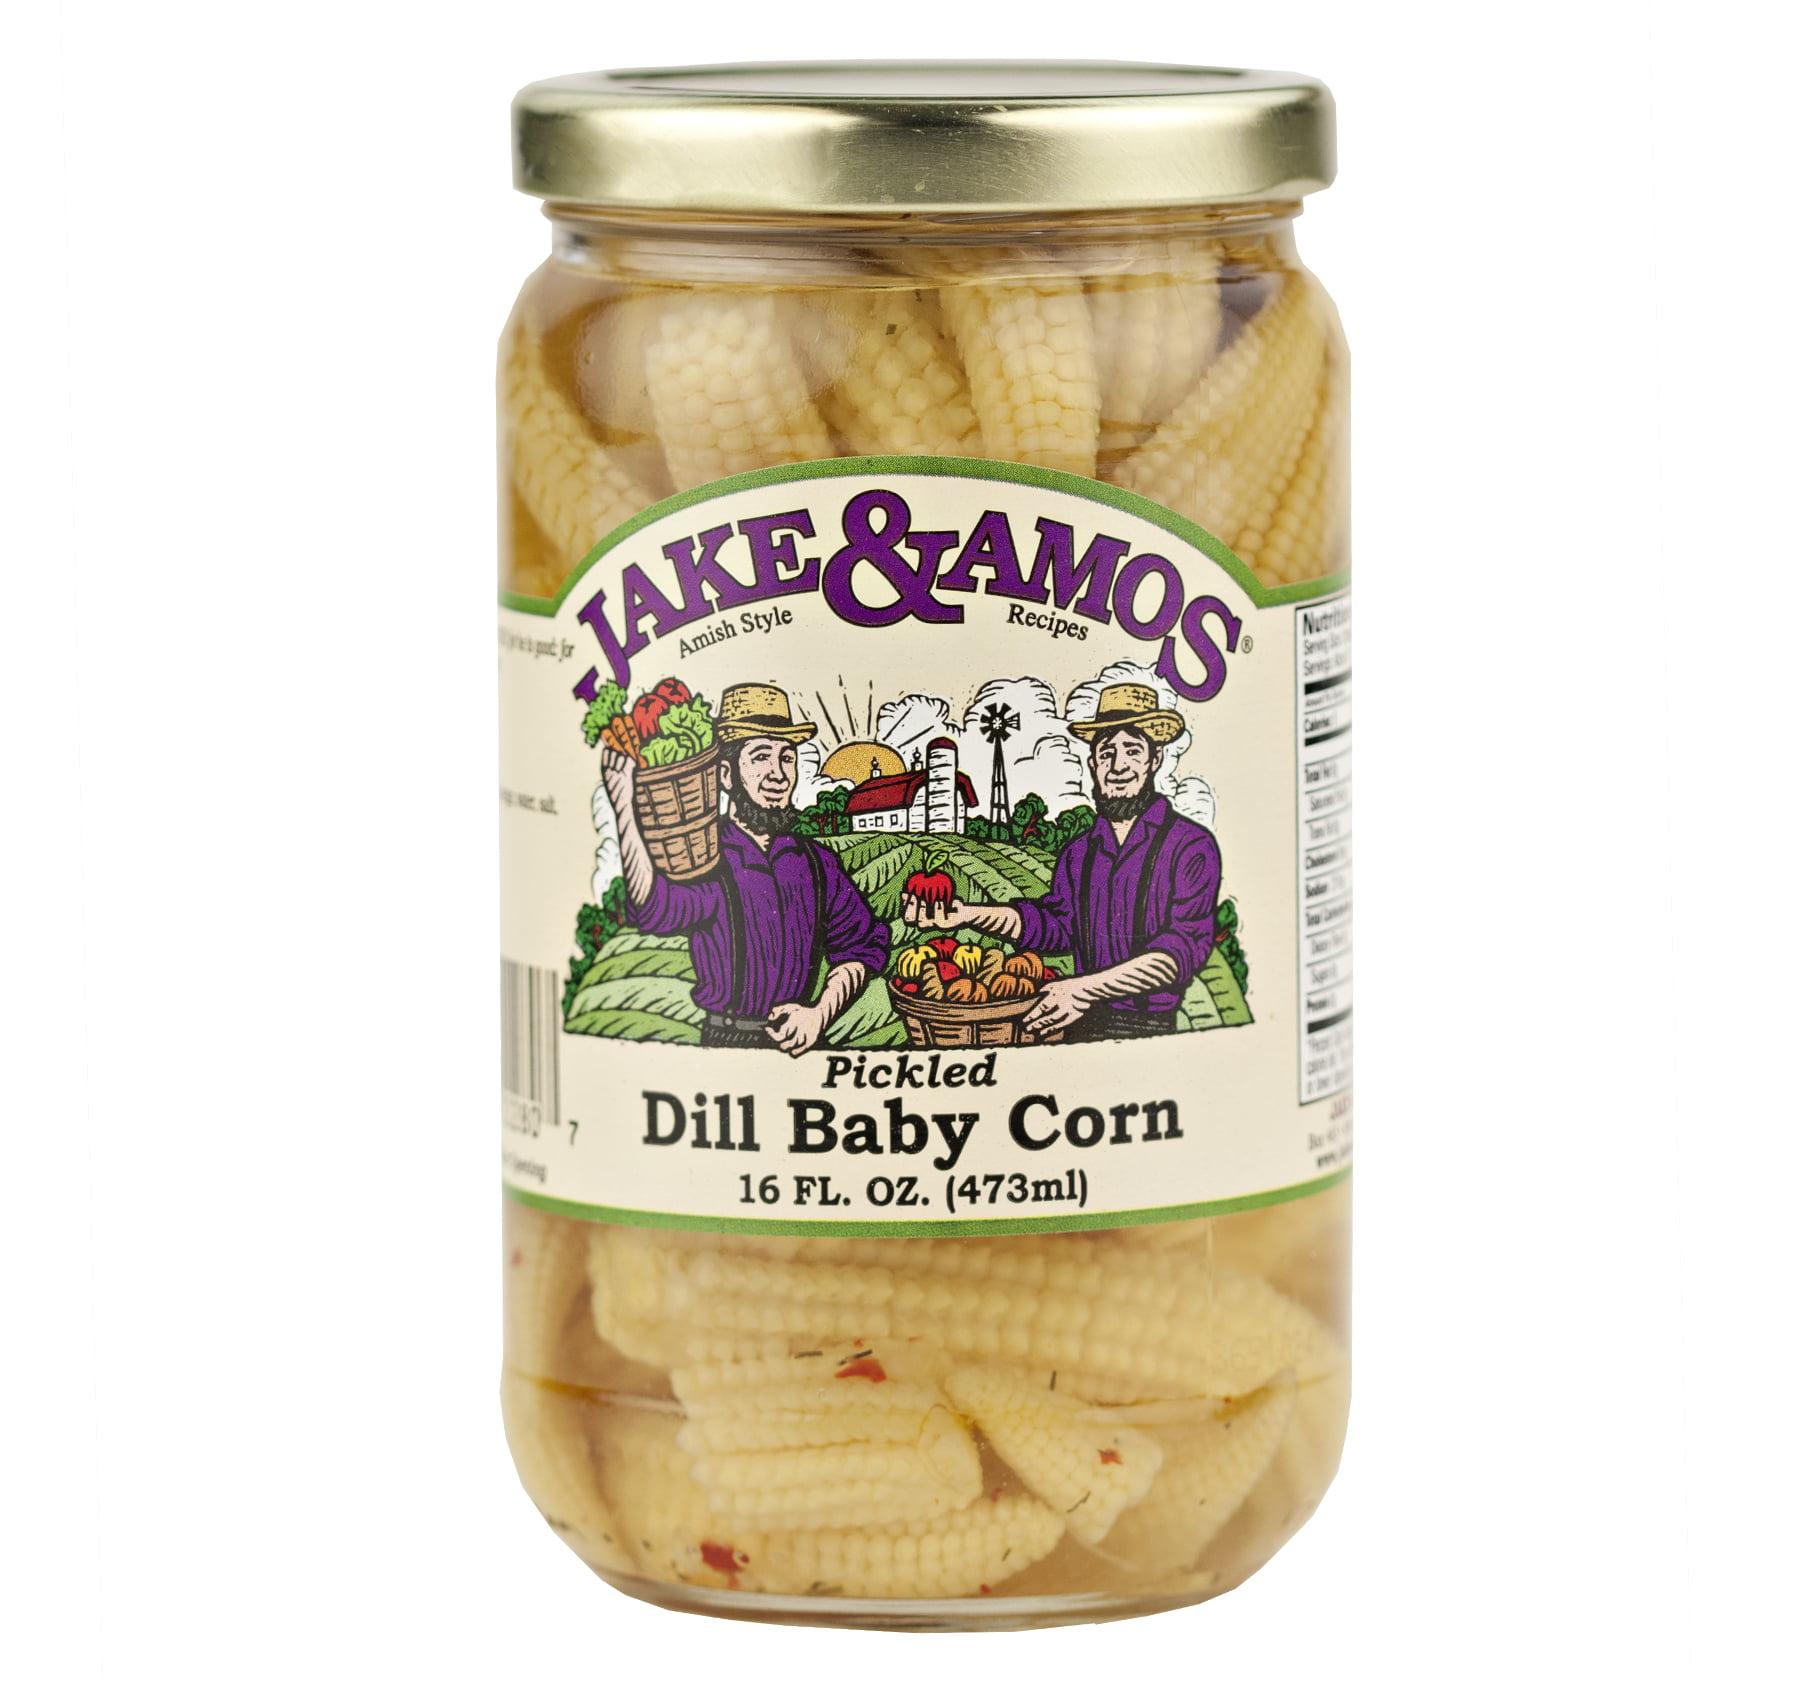 Jake & Amos Pickled Dill Baby Corn 16 oz. (3 Jars)